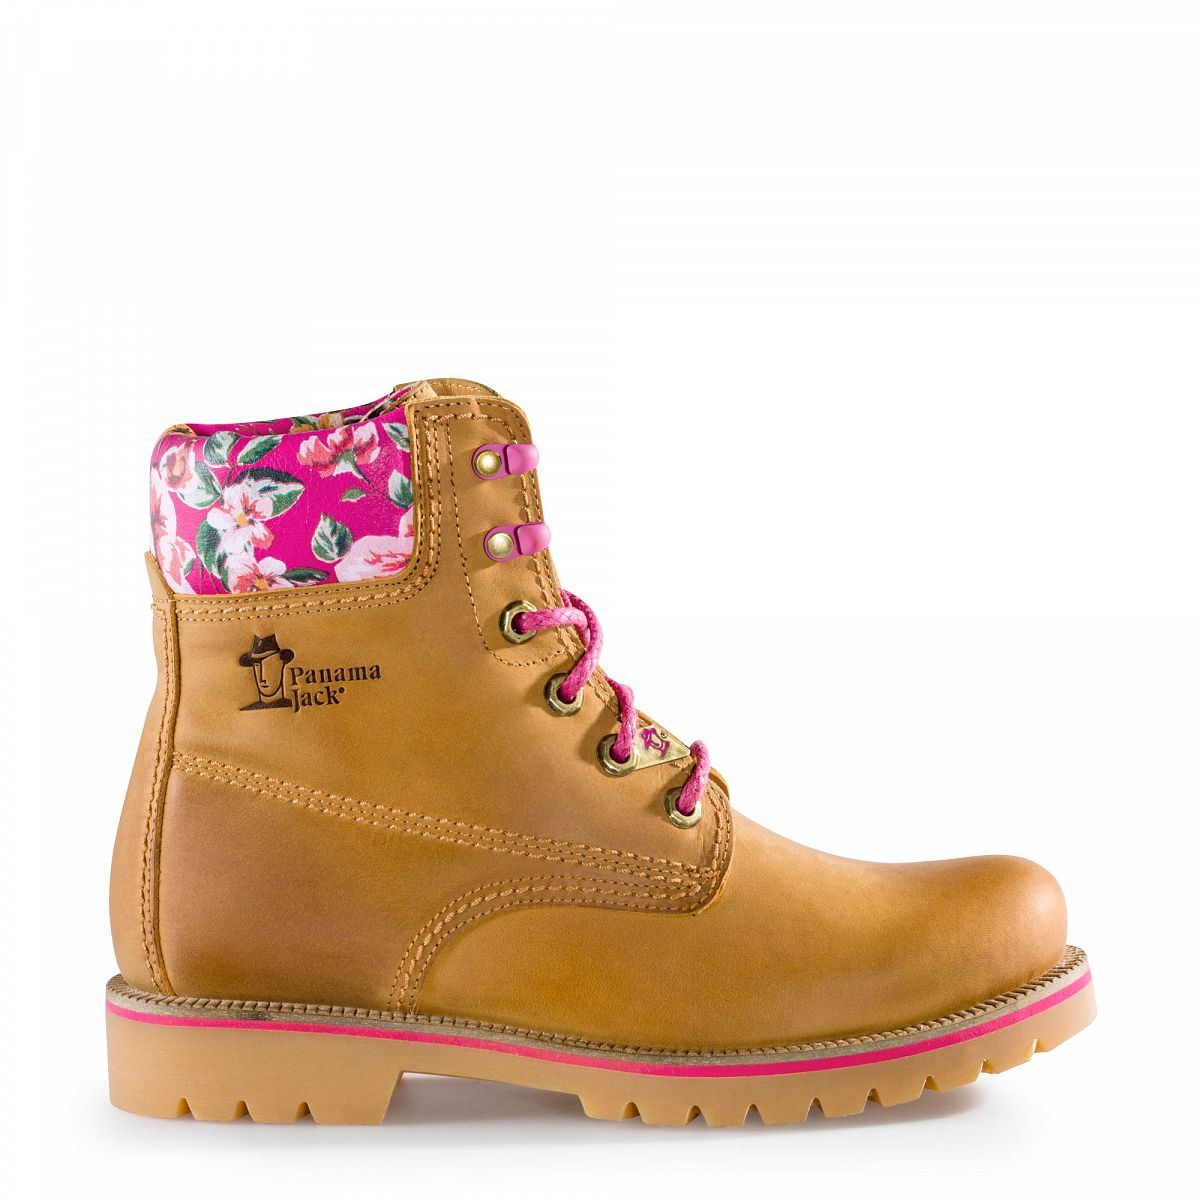 New Panama Jack Singapur Womens Fur Lined Waterproof Leather Boots Size 4